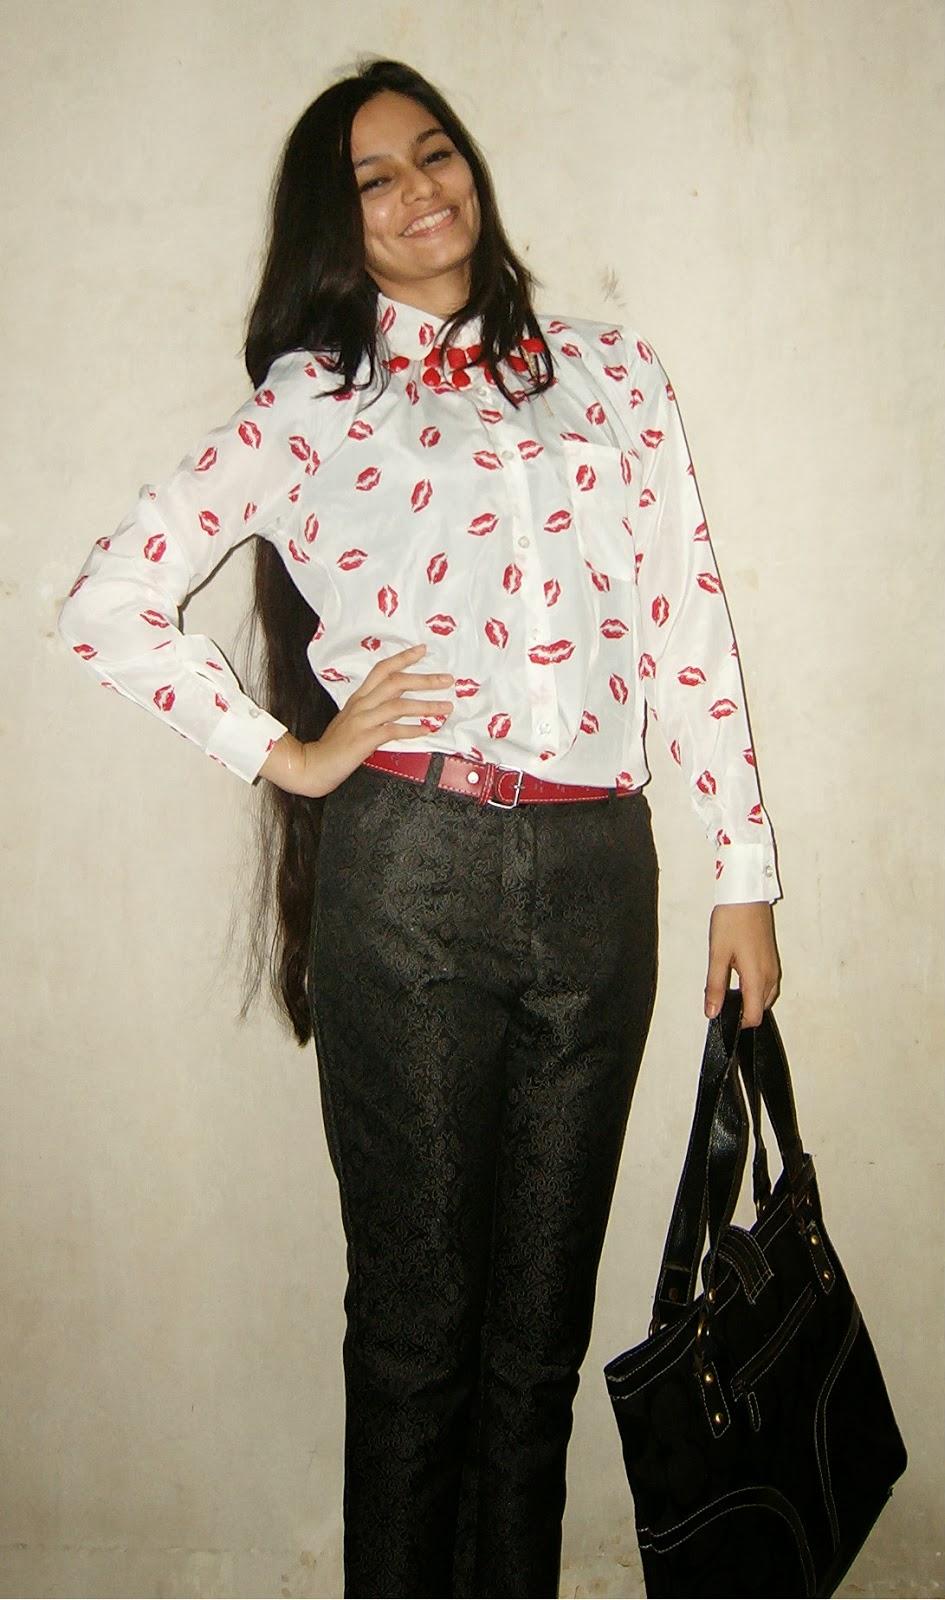 street shopping in mumbai, thrifty shopping, kiss shirt, indian blogger, fashion in mumbai